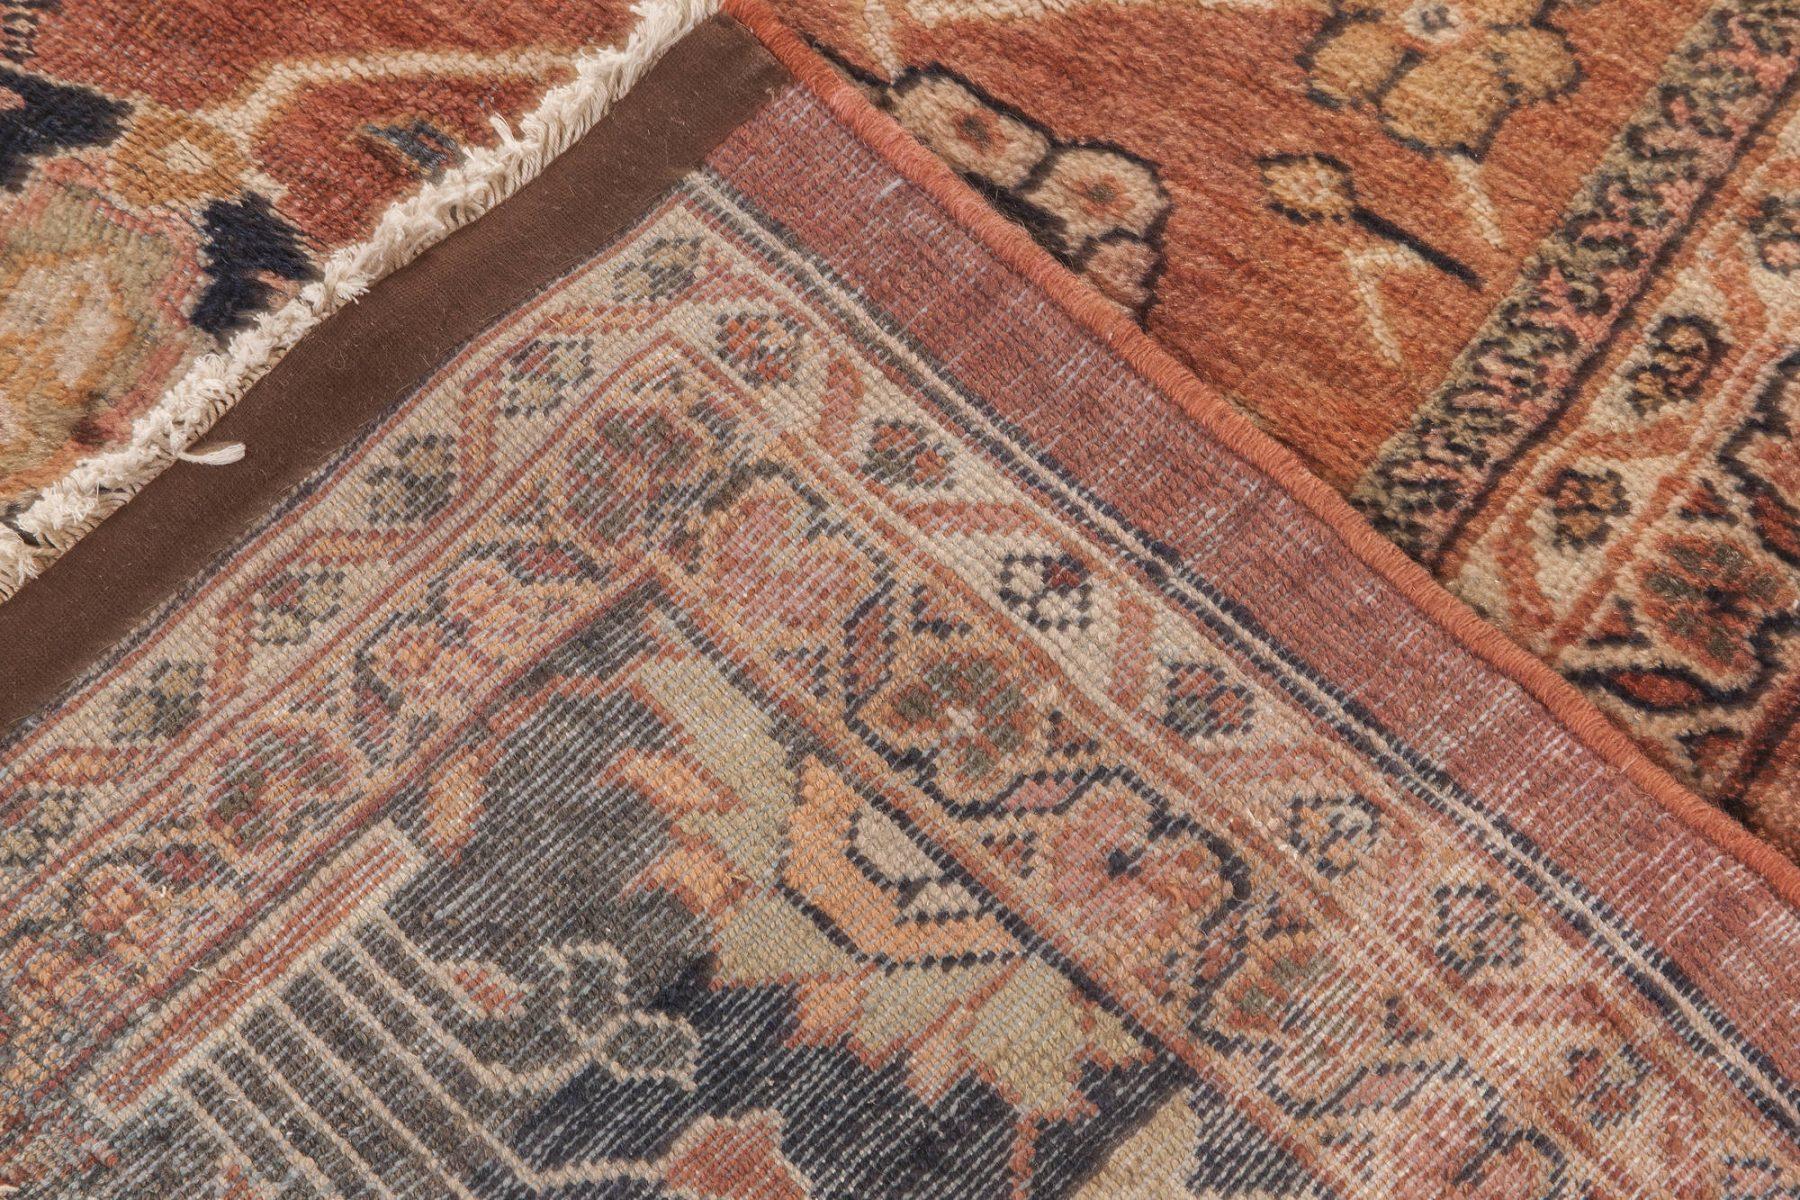 Antique Persian Sultanabad Cinnamon & Navy Blue Handwoven Carpet BB6597